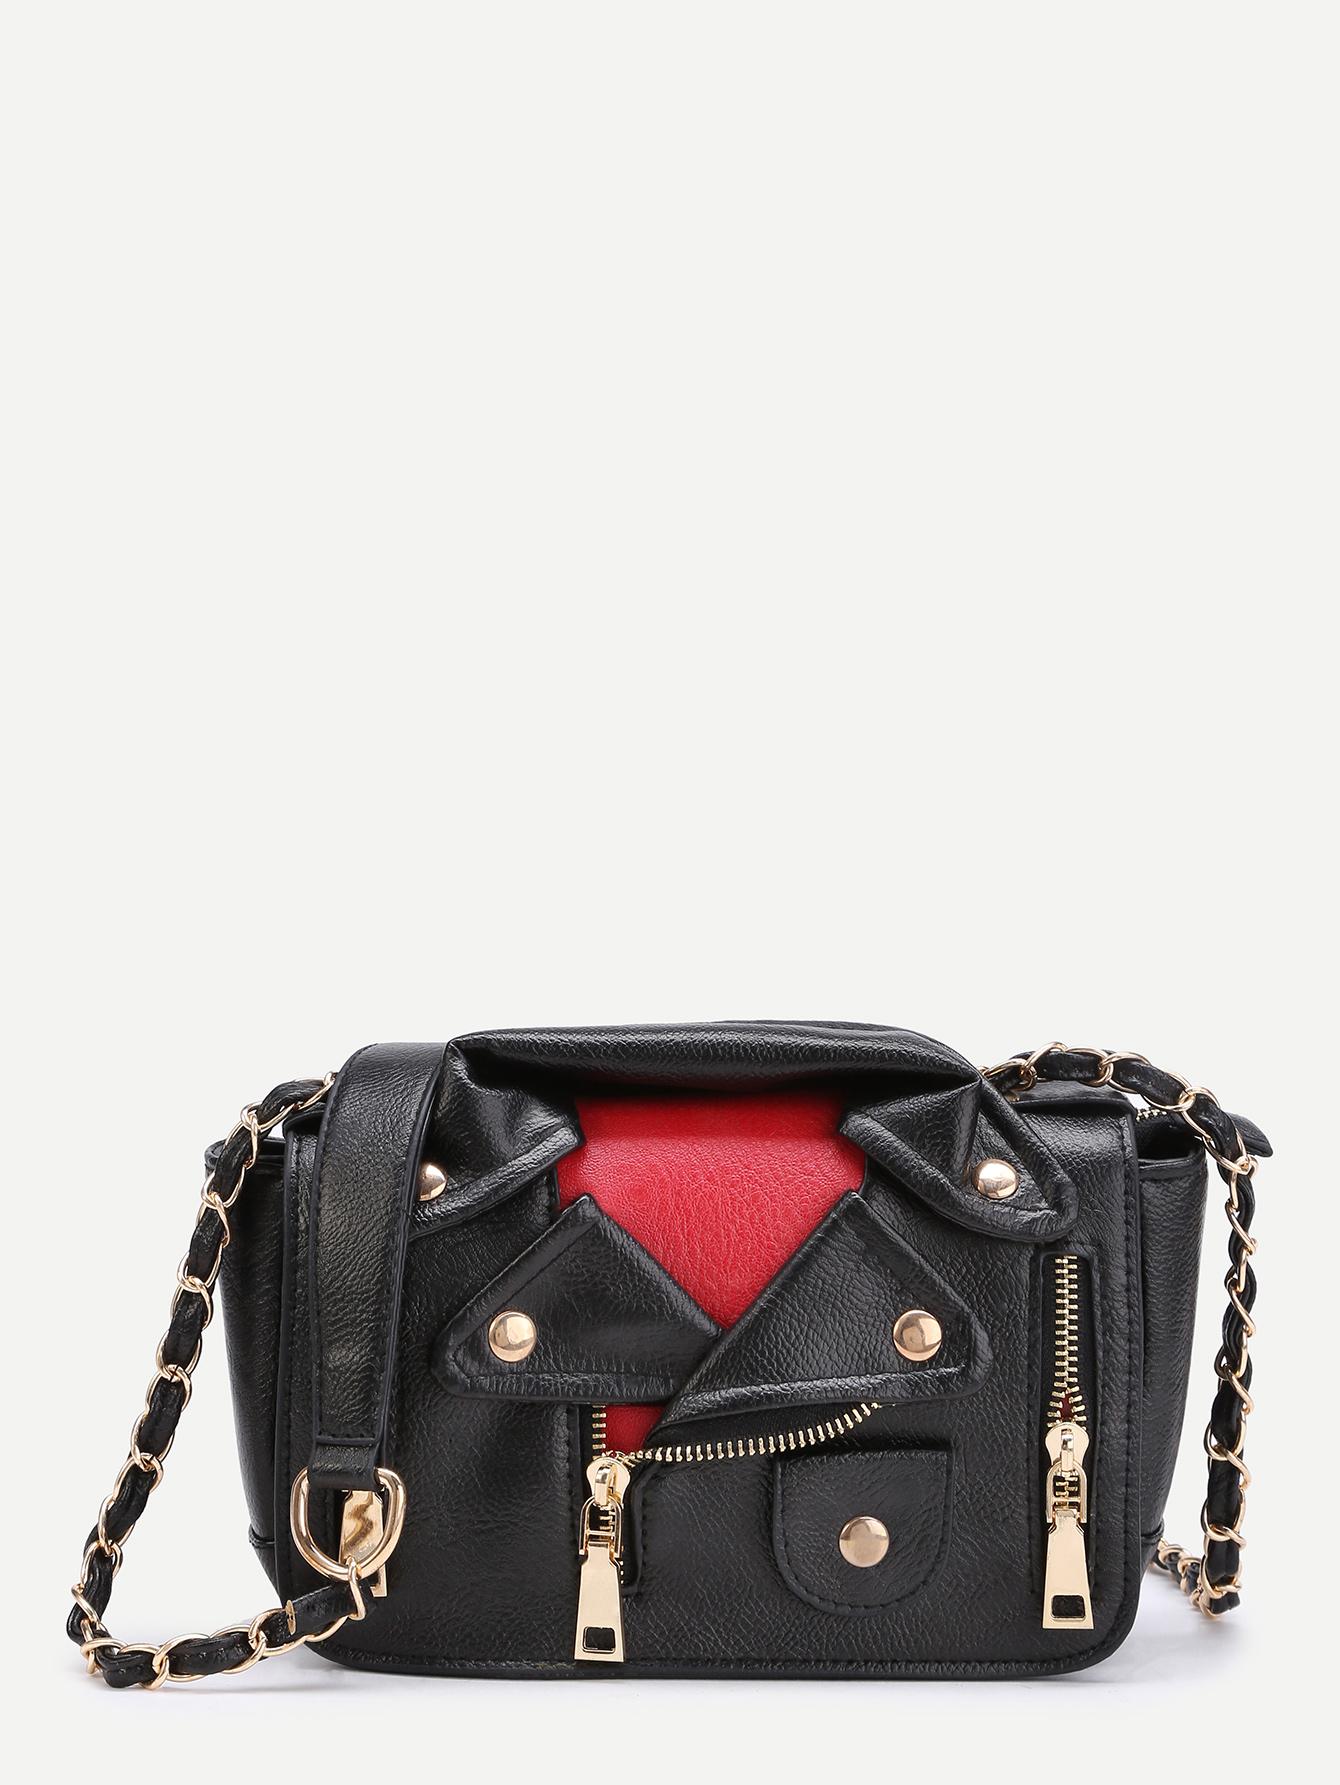 e5935a9d362 Shop Jacket Shaped Shoulder Bag online. SheIn offers Jacket Shaped Shoulder  Bag & more to fit your fashionable needs.